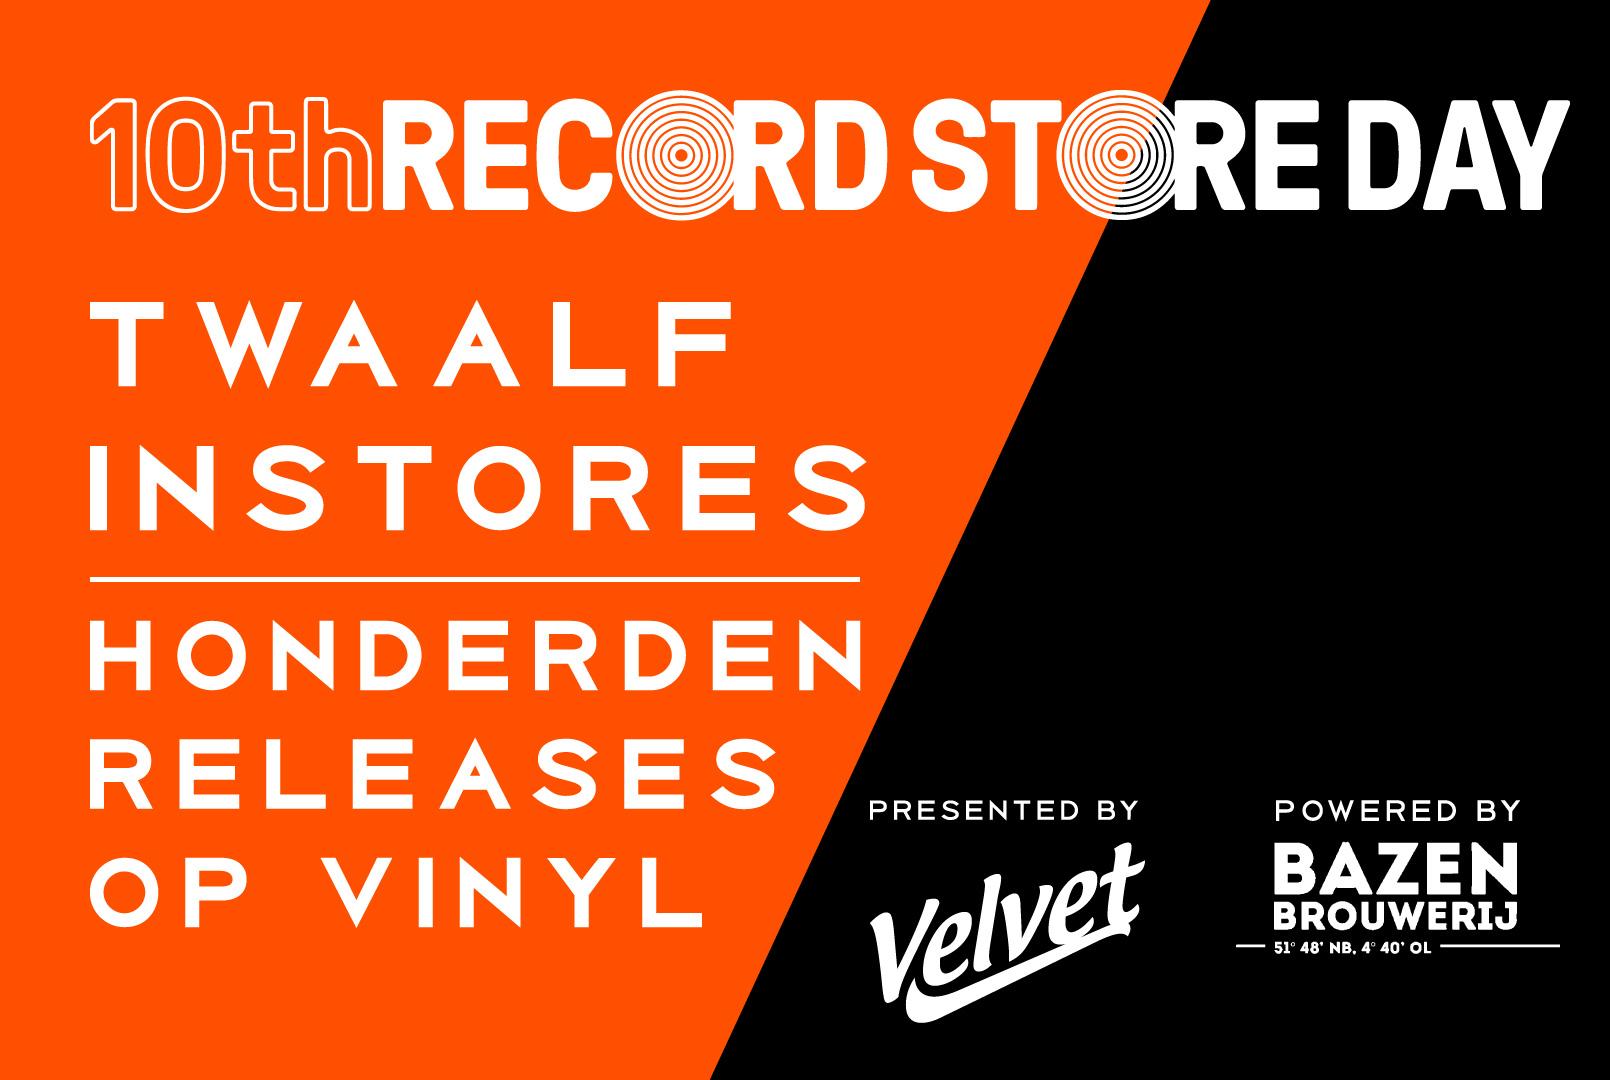 Record Store Day 2019 | Instore optredens | Velvet Music Dordrecht | Het Magazijn